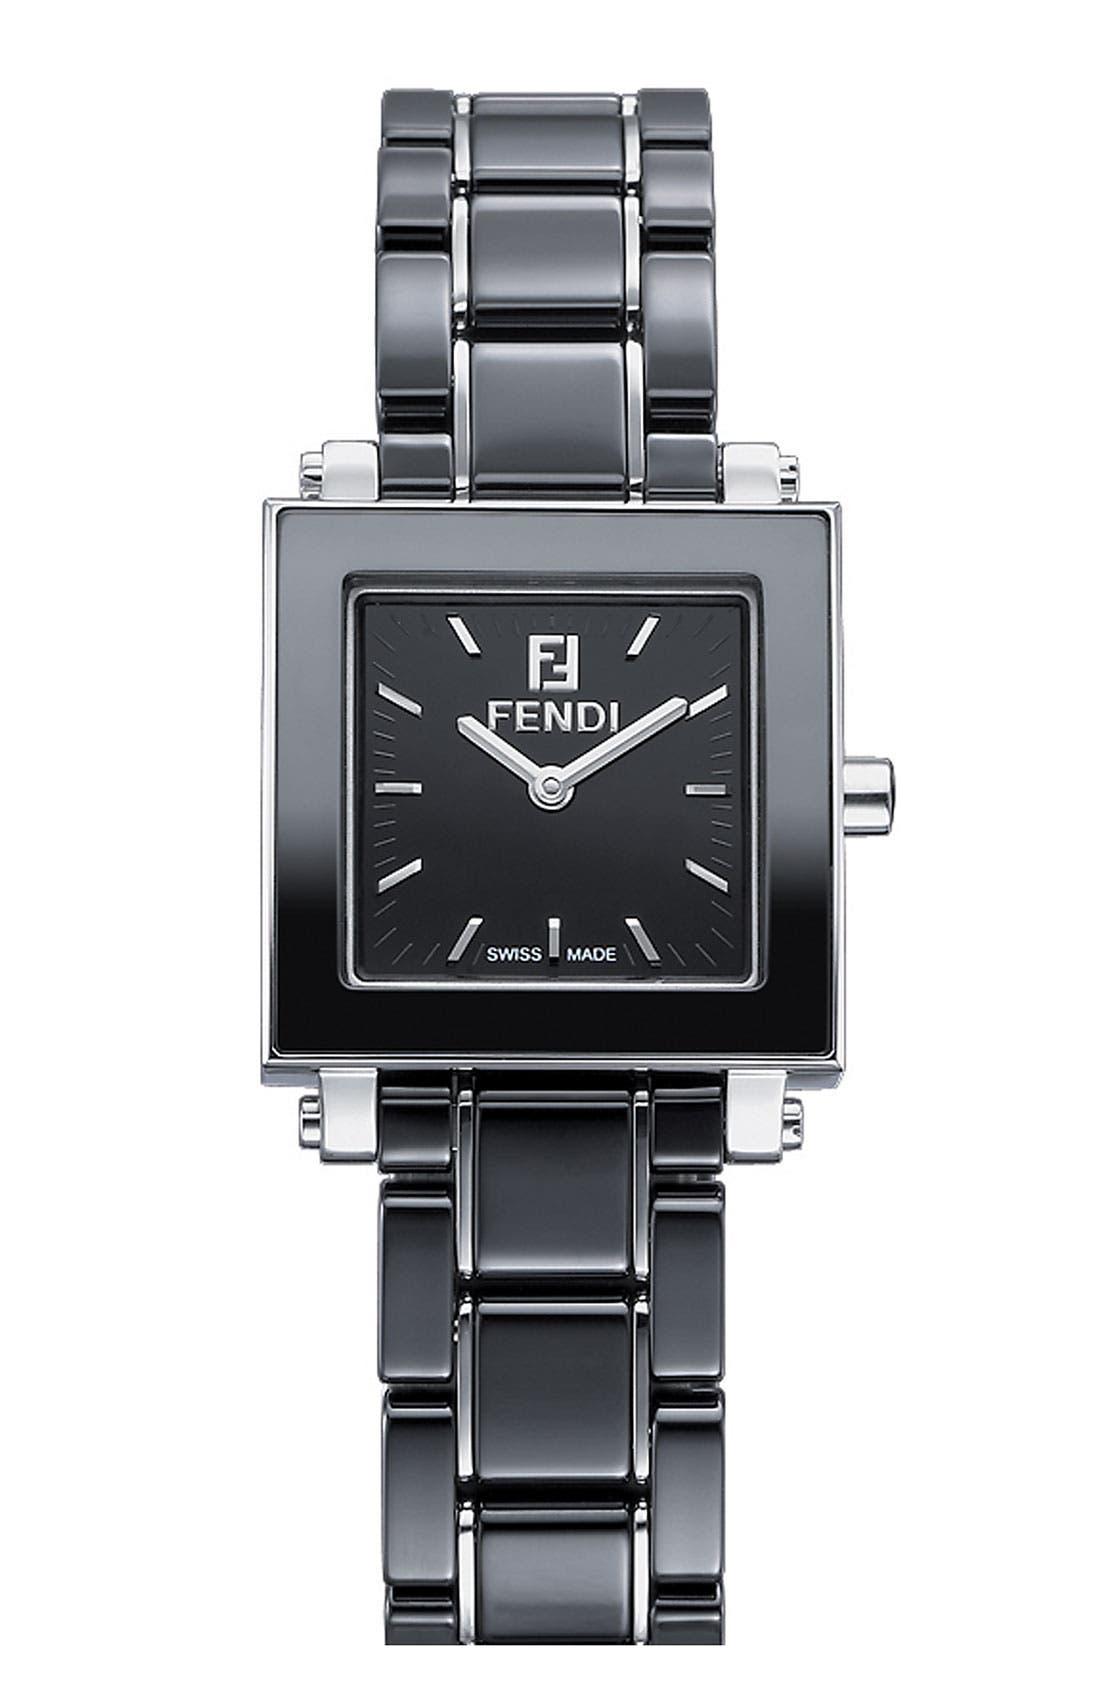 Alternate Image 1 Selected - Fendi Ceramic Square Case Watch, 25mm